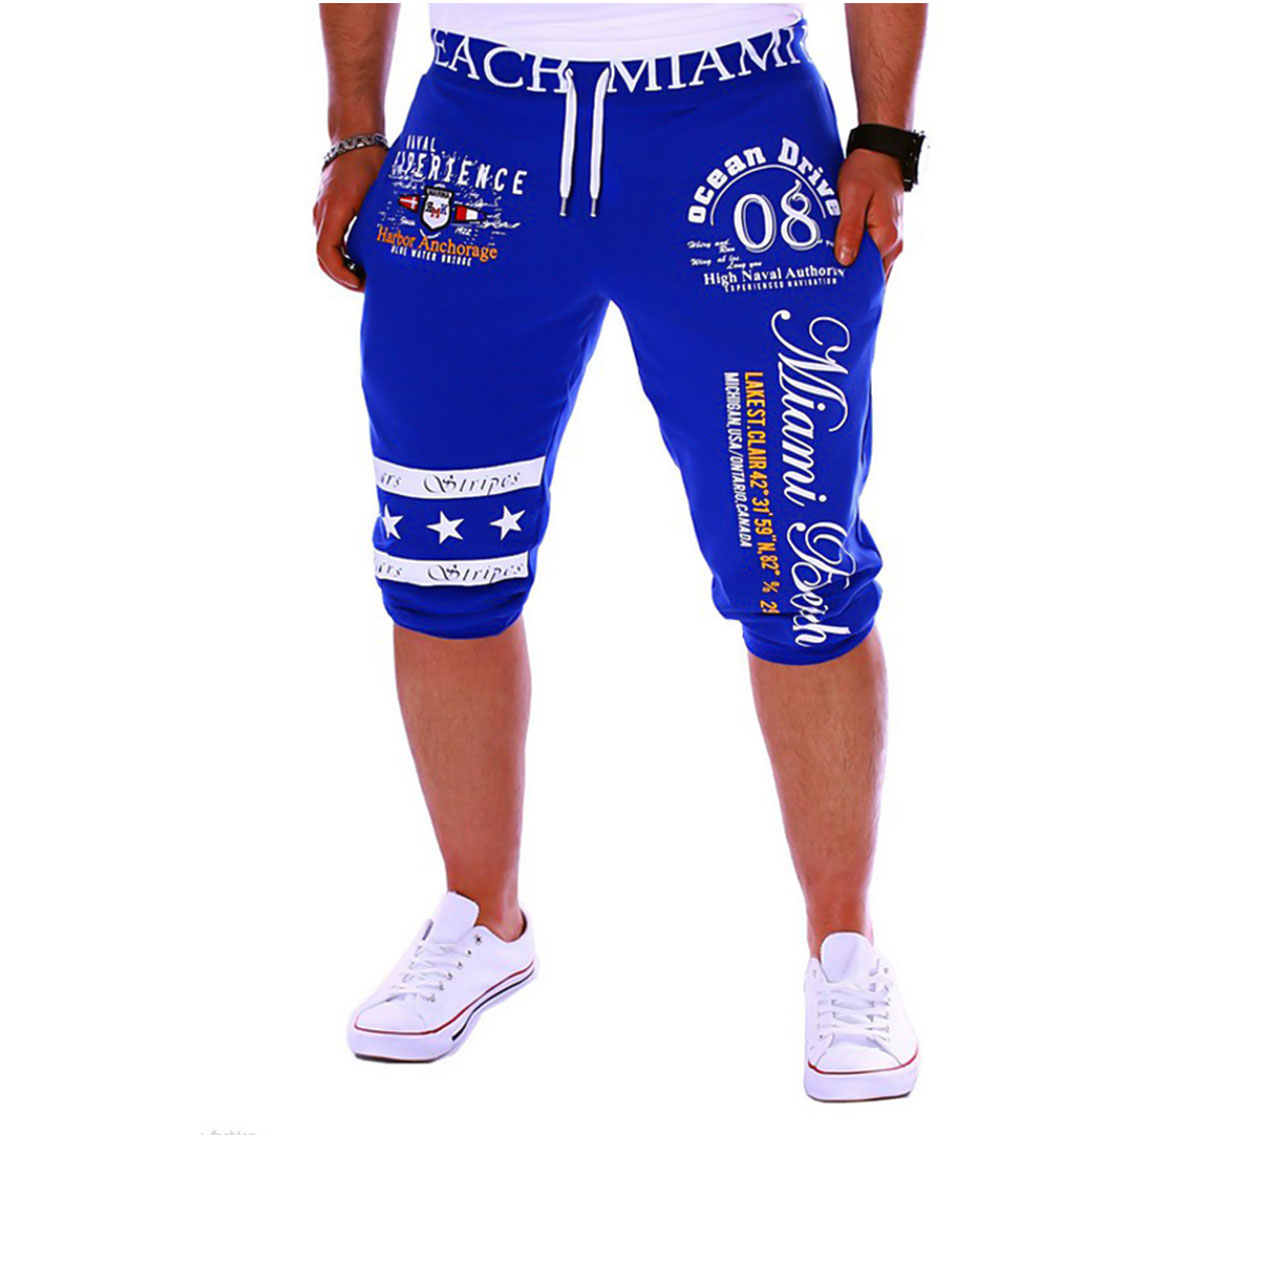 Men's Active / Basic Sports Weekend Loose / wfh Sweatpants / Shorts Pants - Letter Print Blue